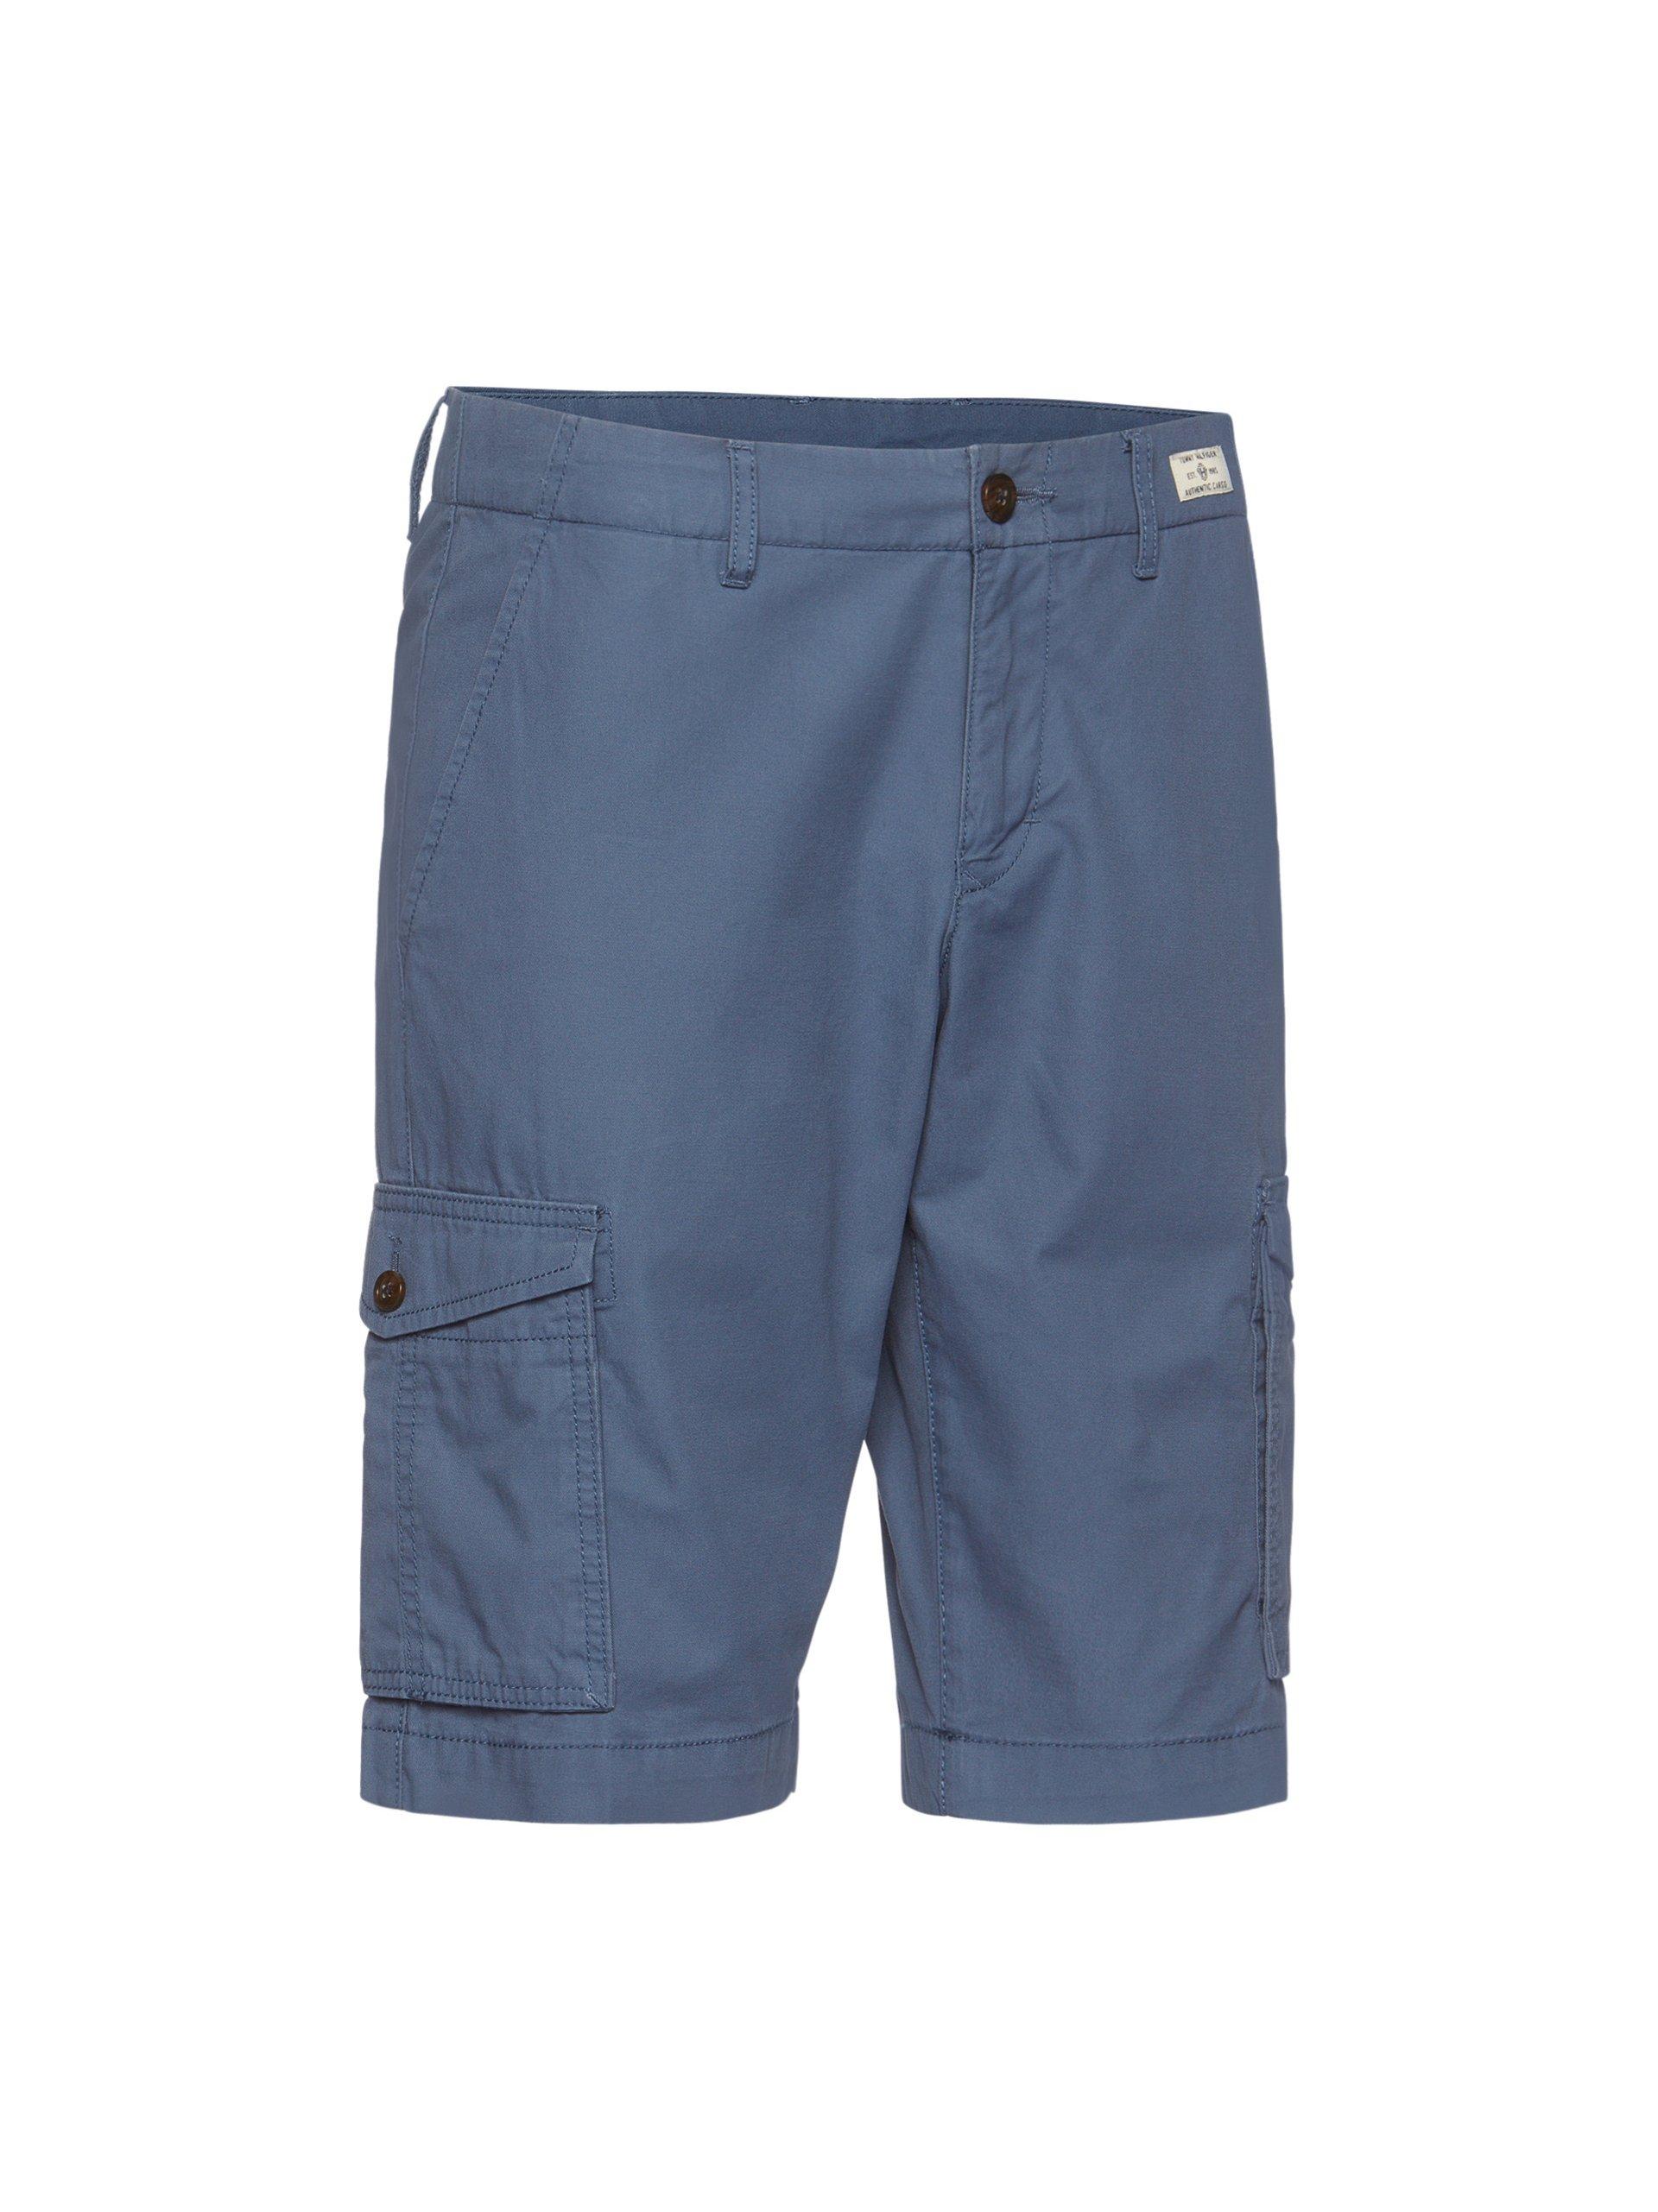 Tommy Hilfiger Herren Shorts - John